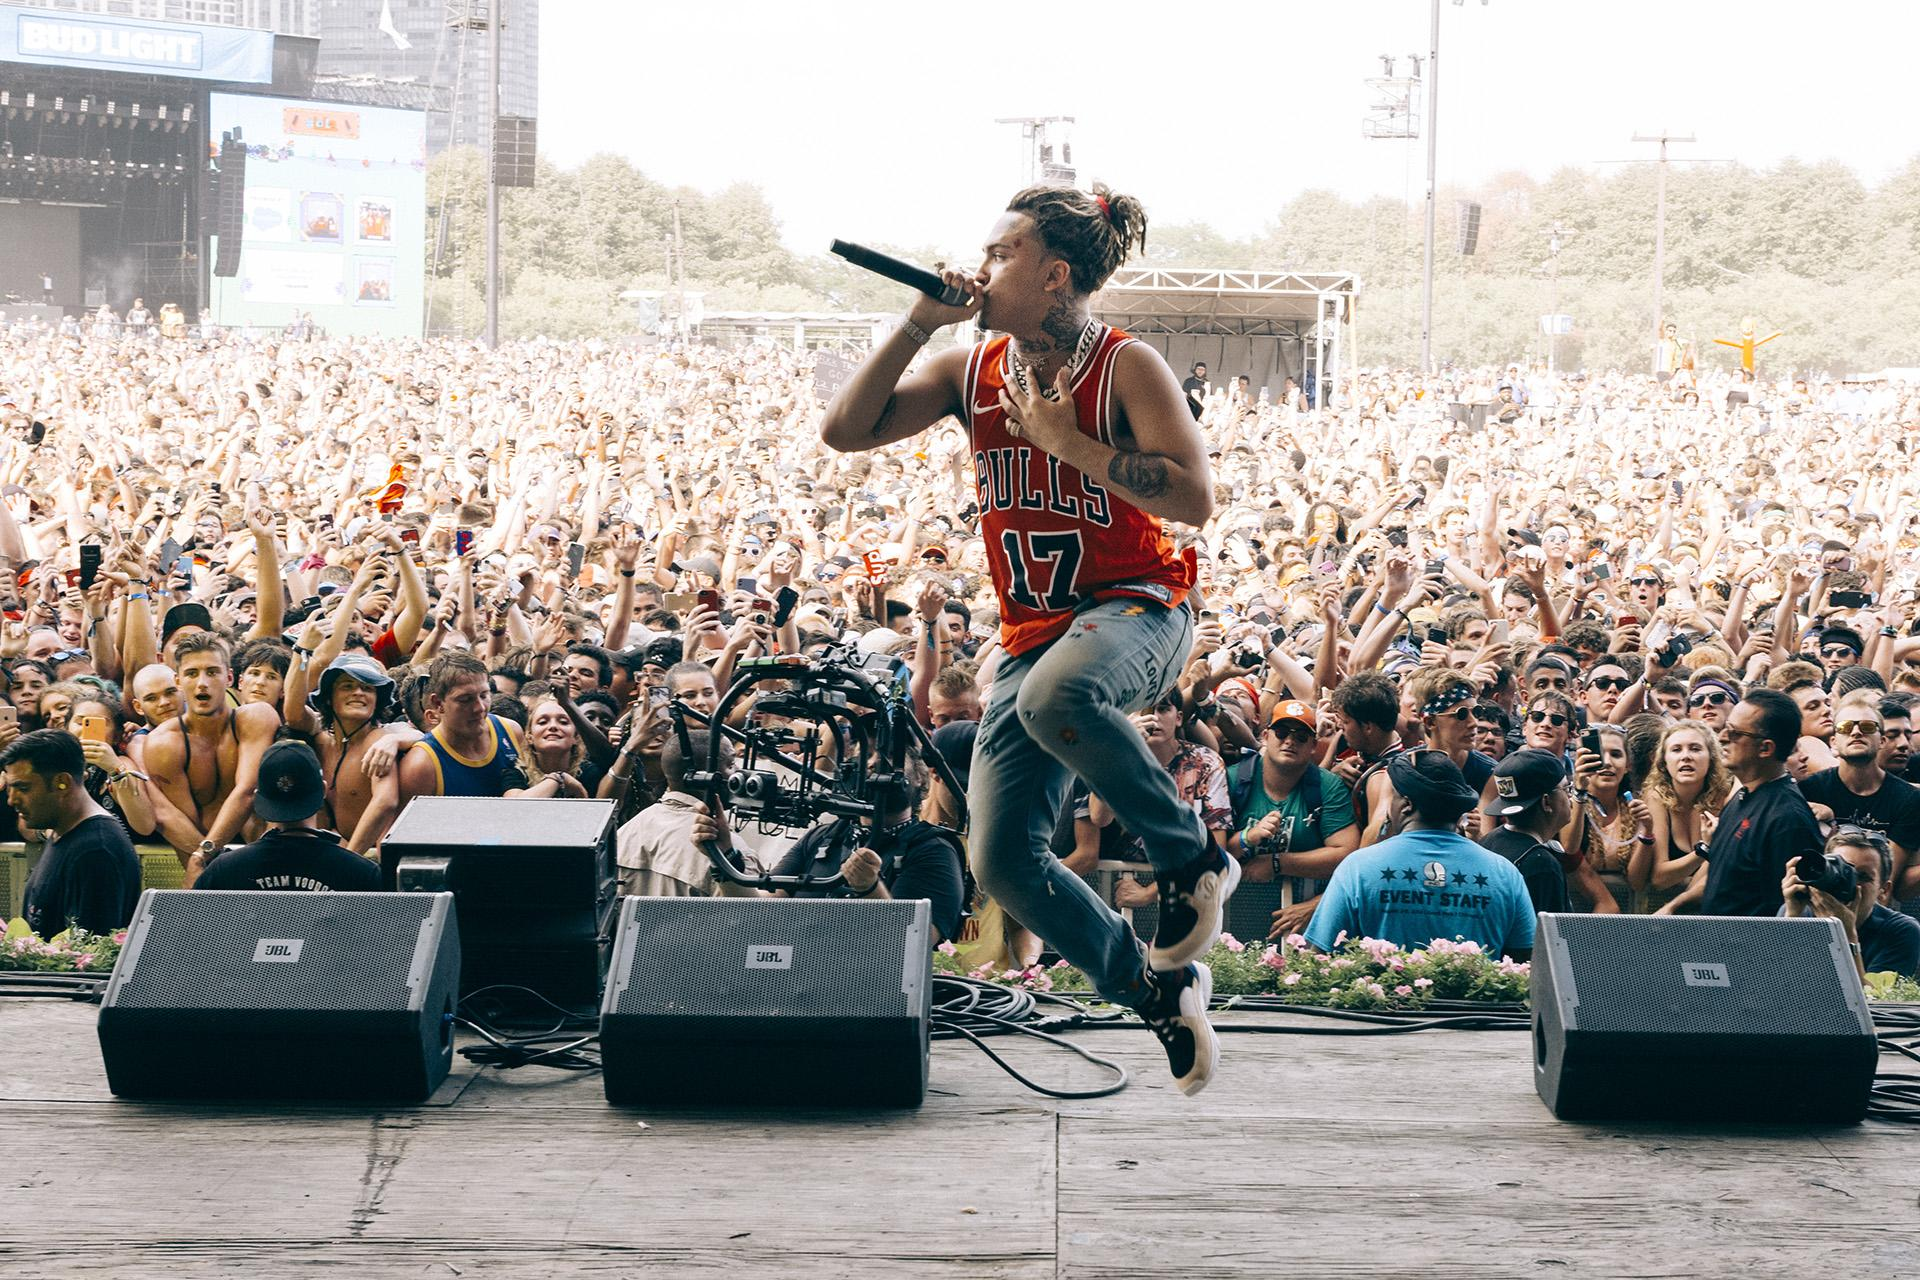 (Scott Witt / Lollapalooza 2018)